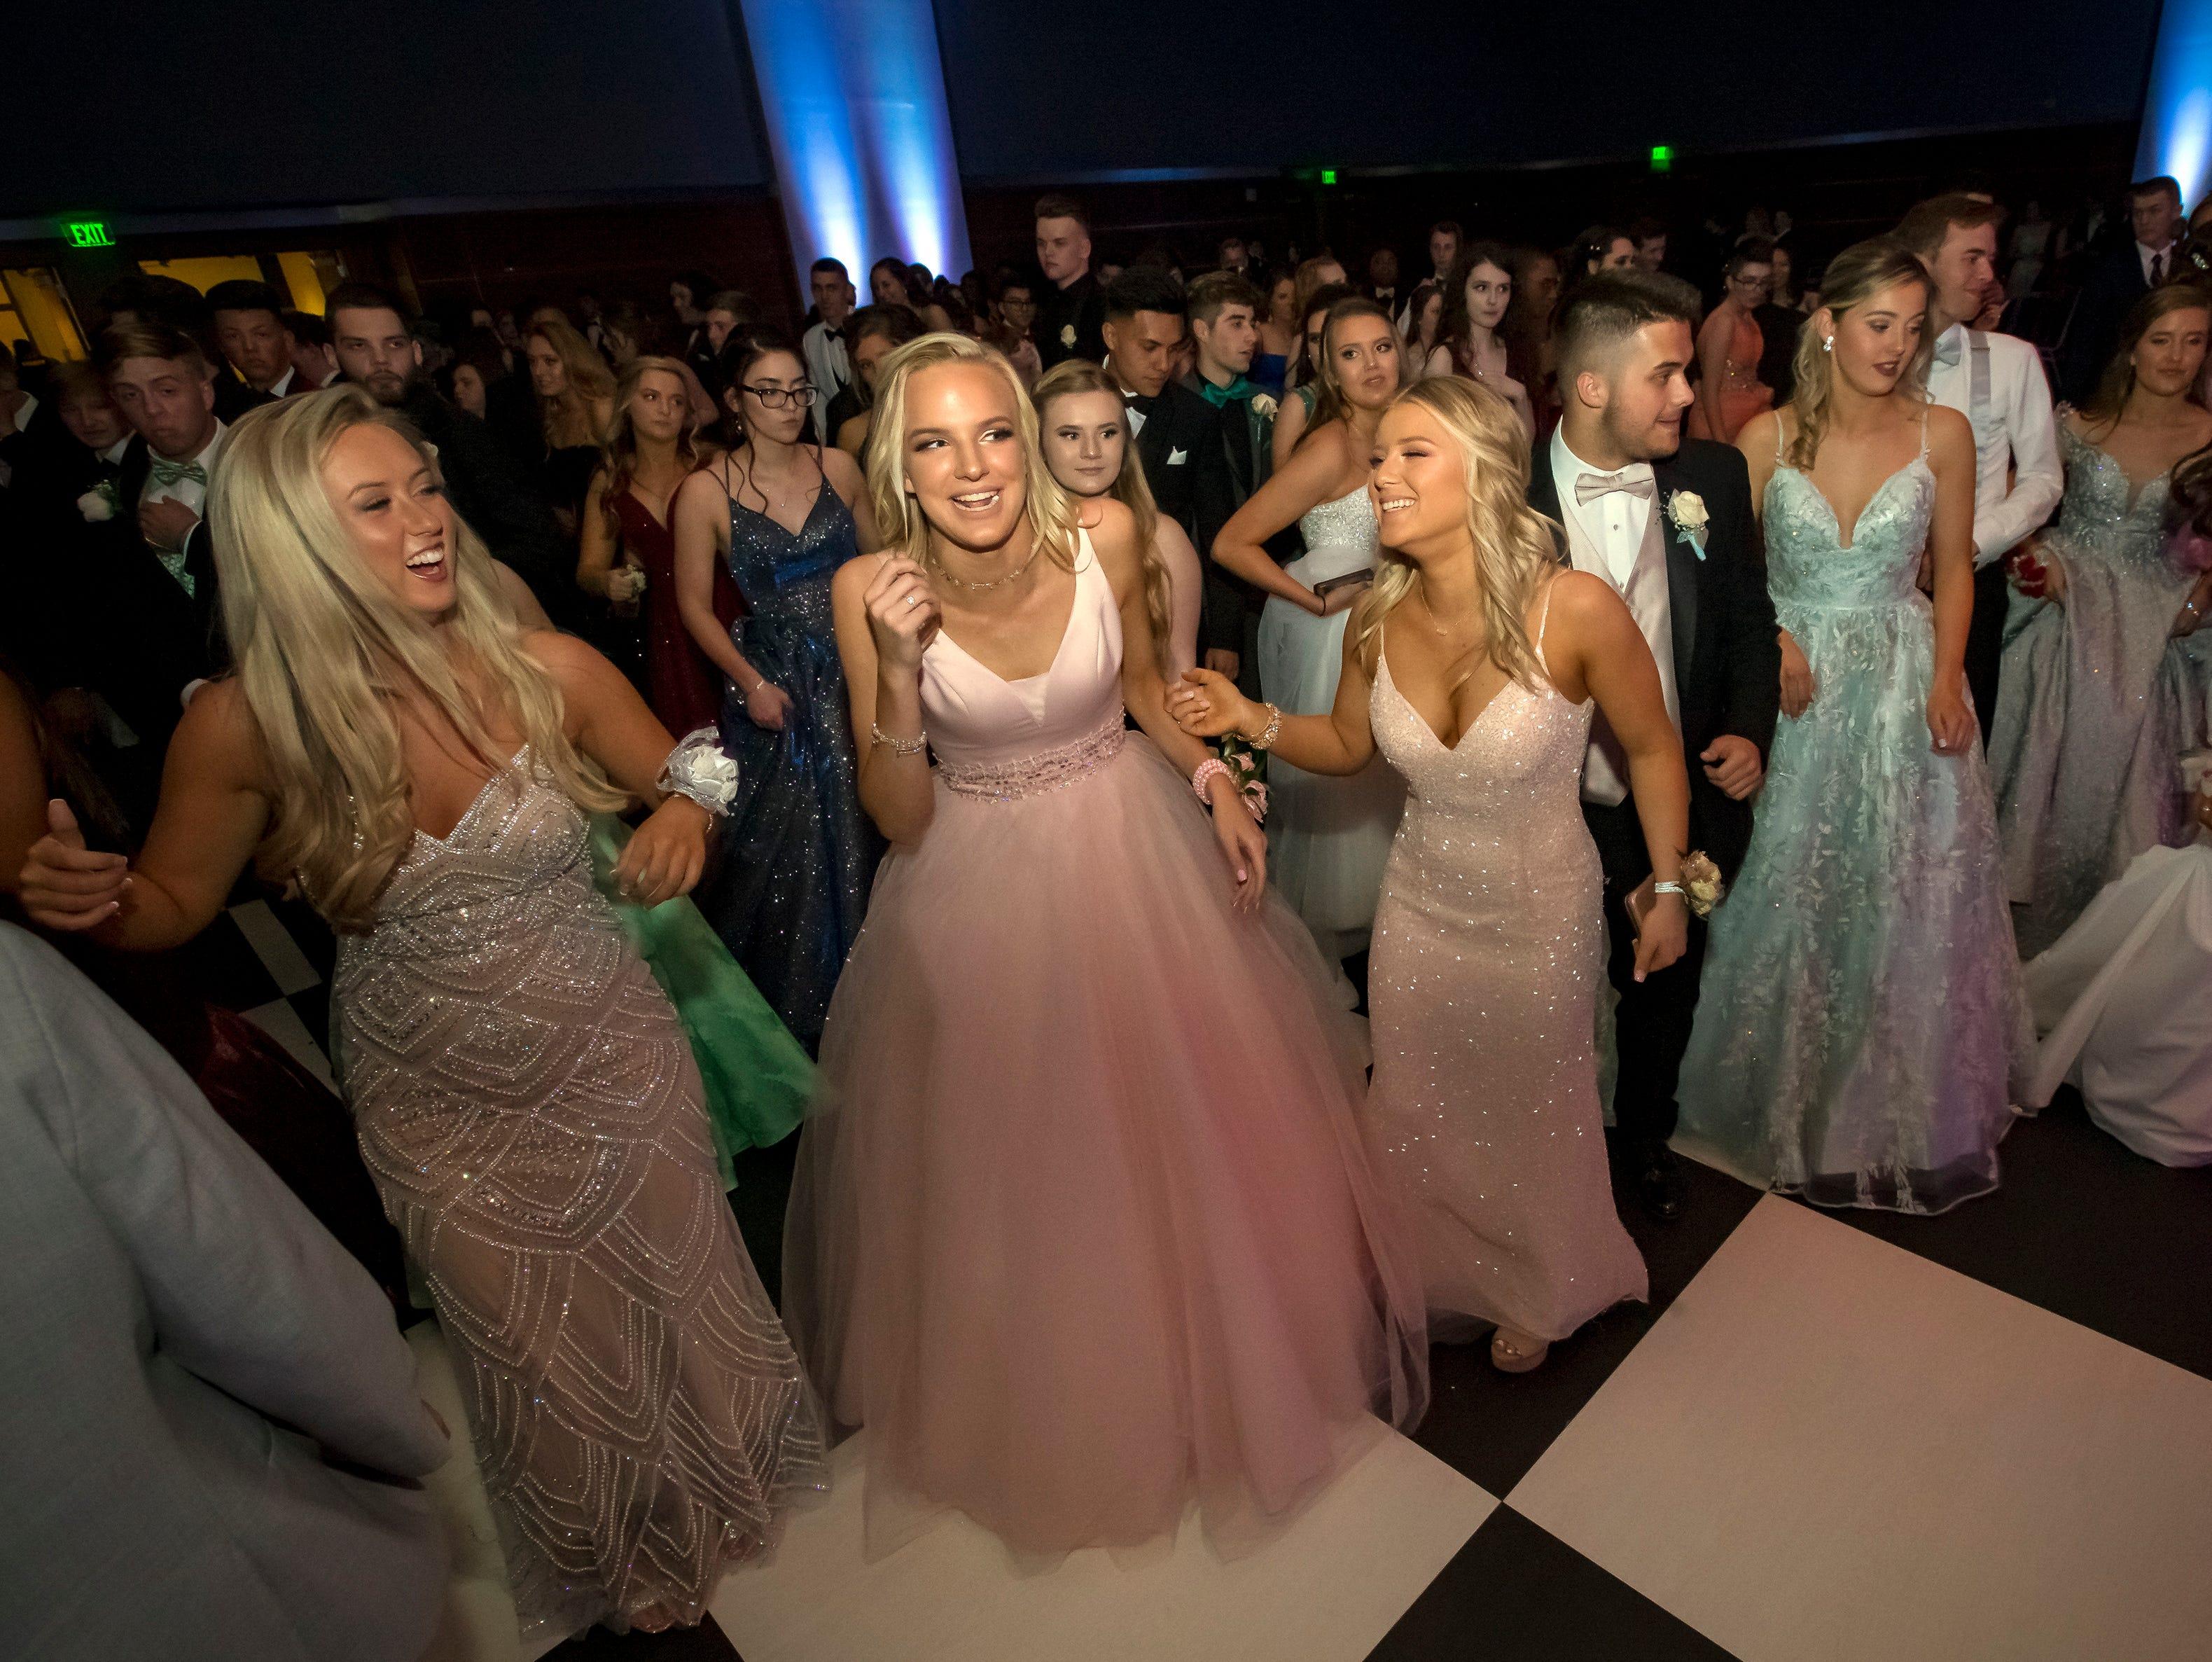 Stewarts Creek High School prom held at MTSU, Friday, April 5, 2019.